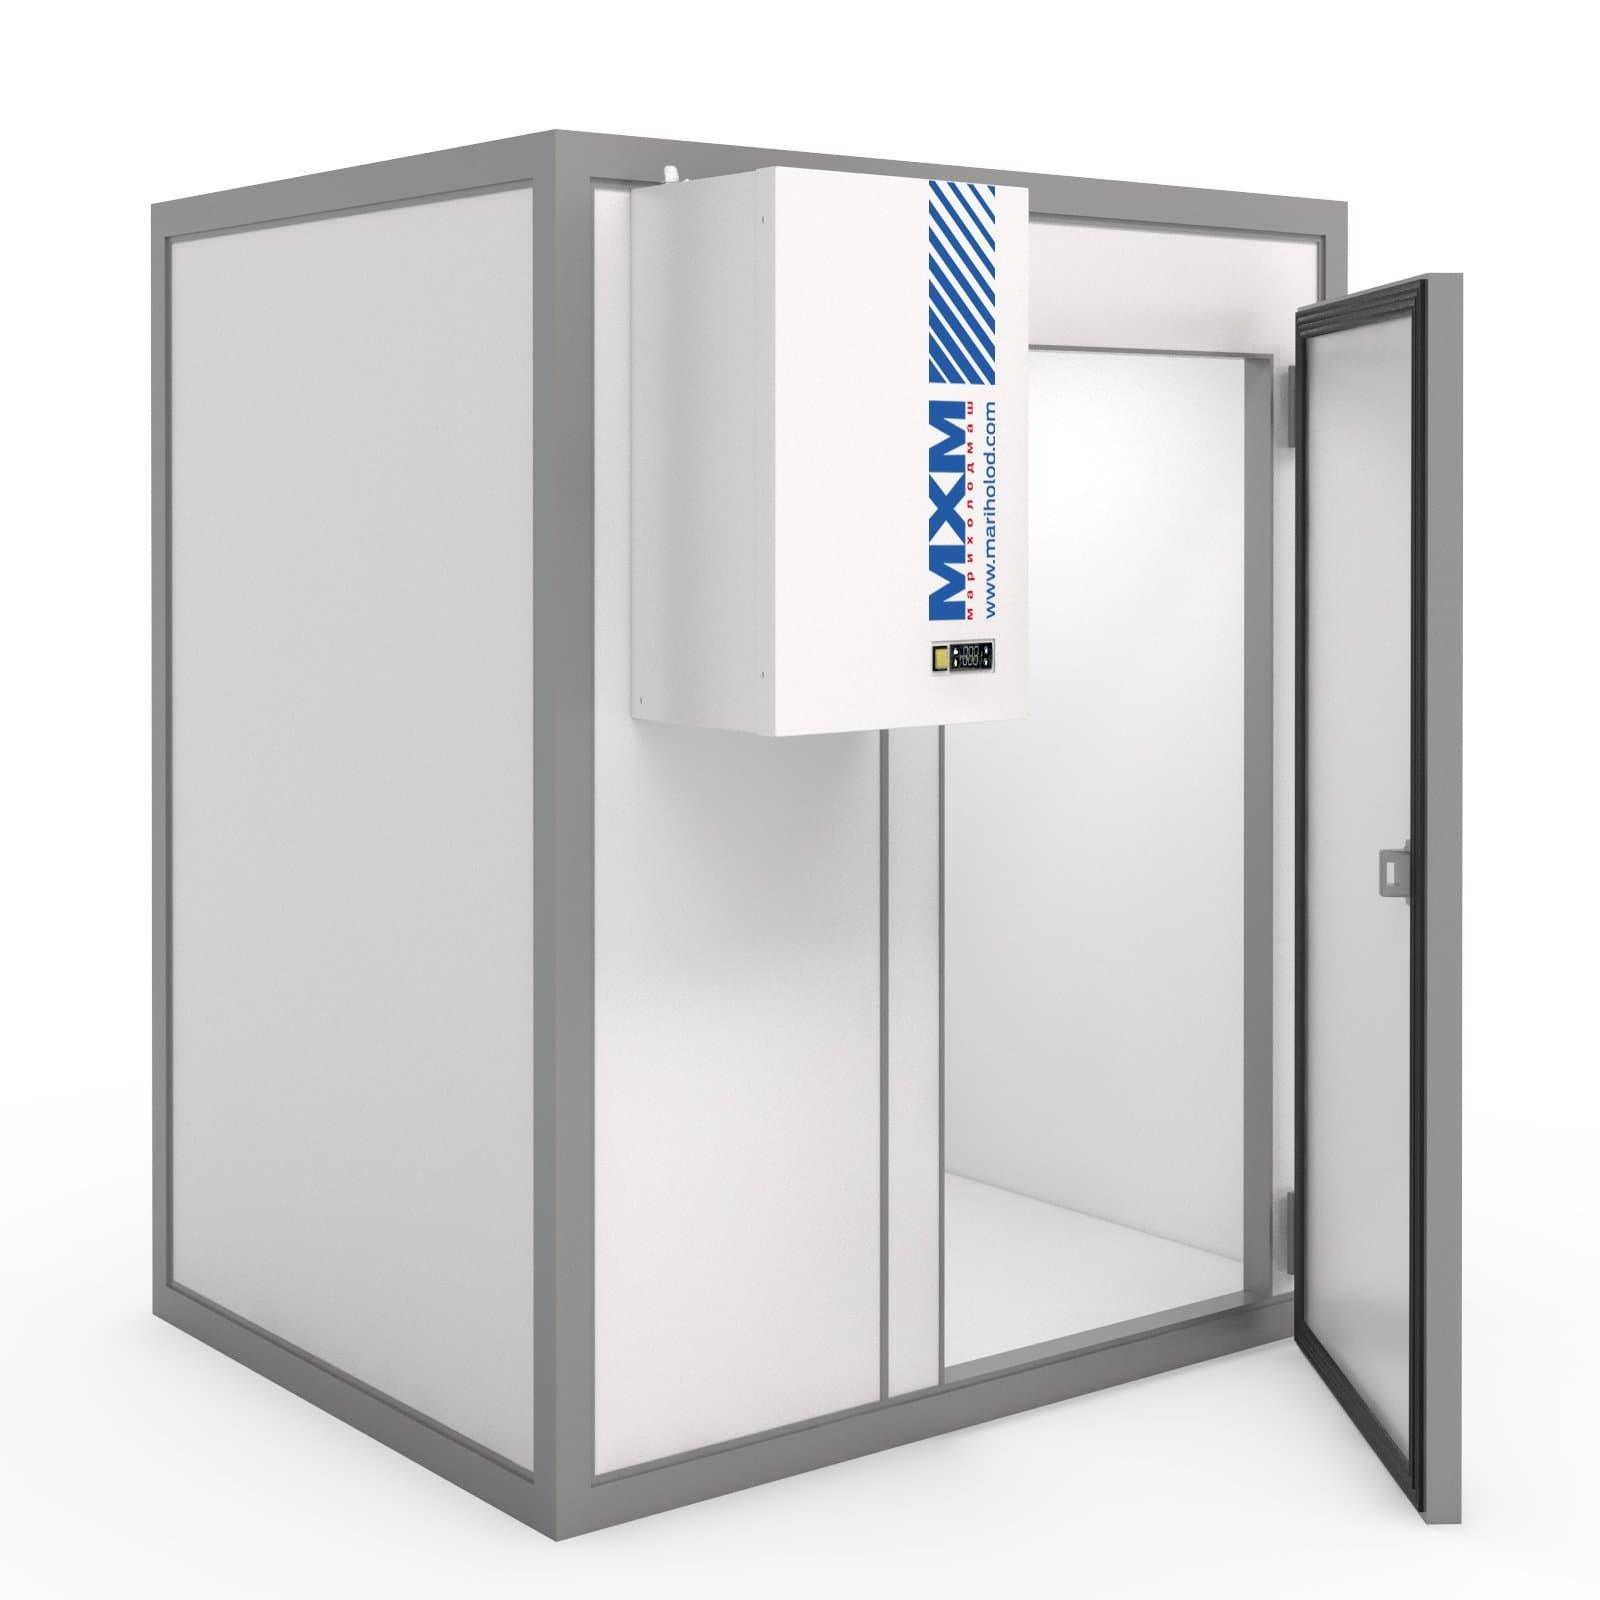 Камера холодильная МХМ КХН-22,36 1360×8260×2460